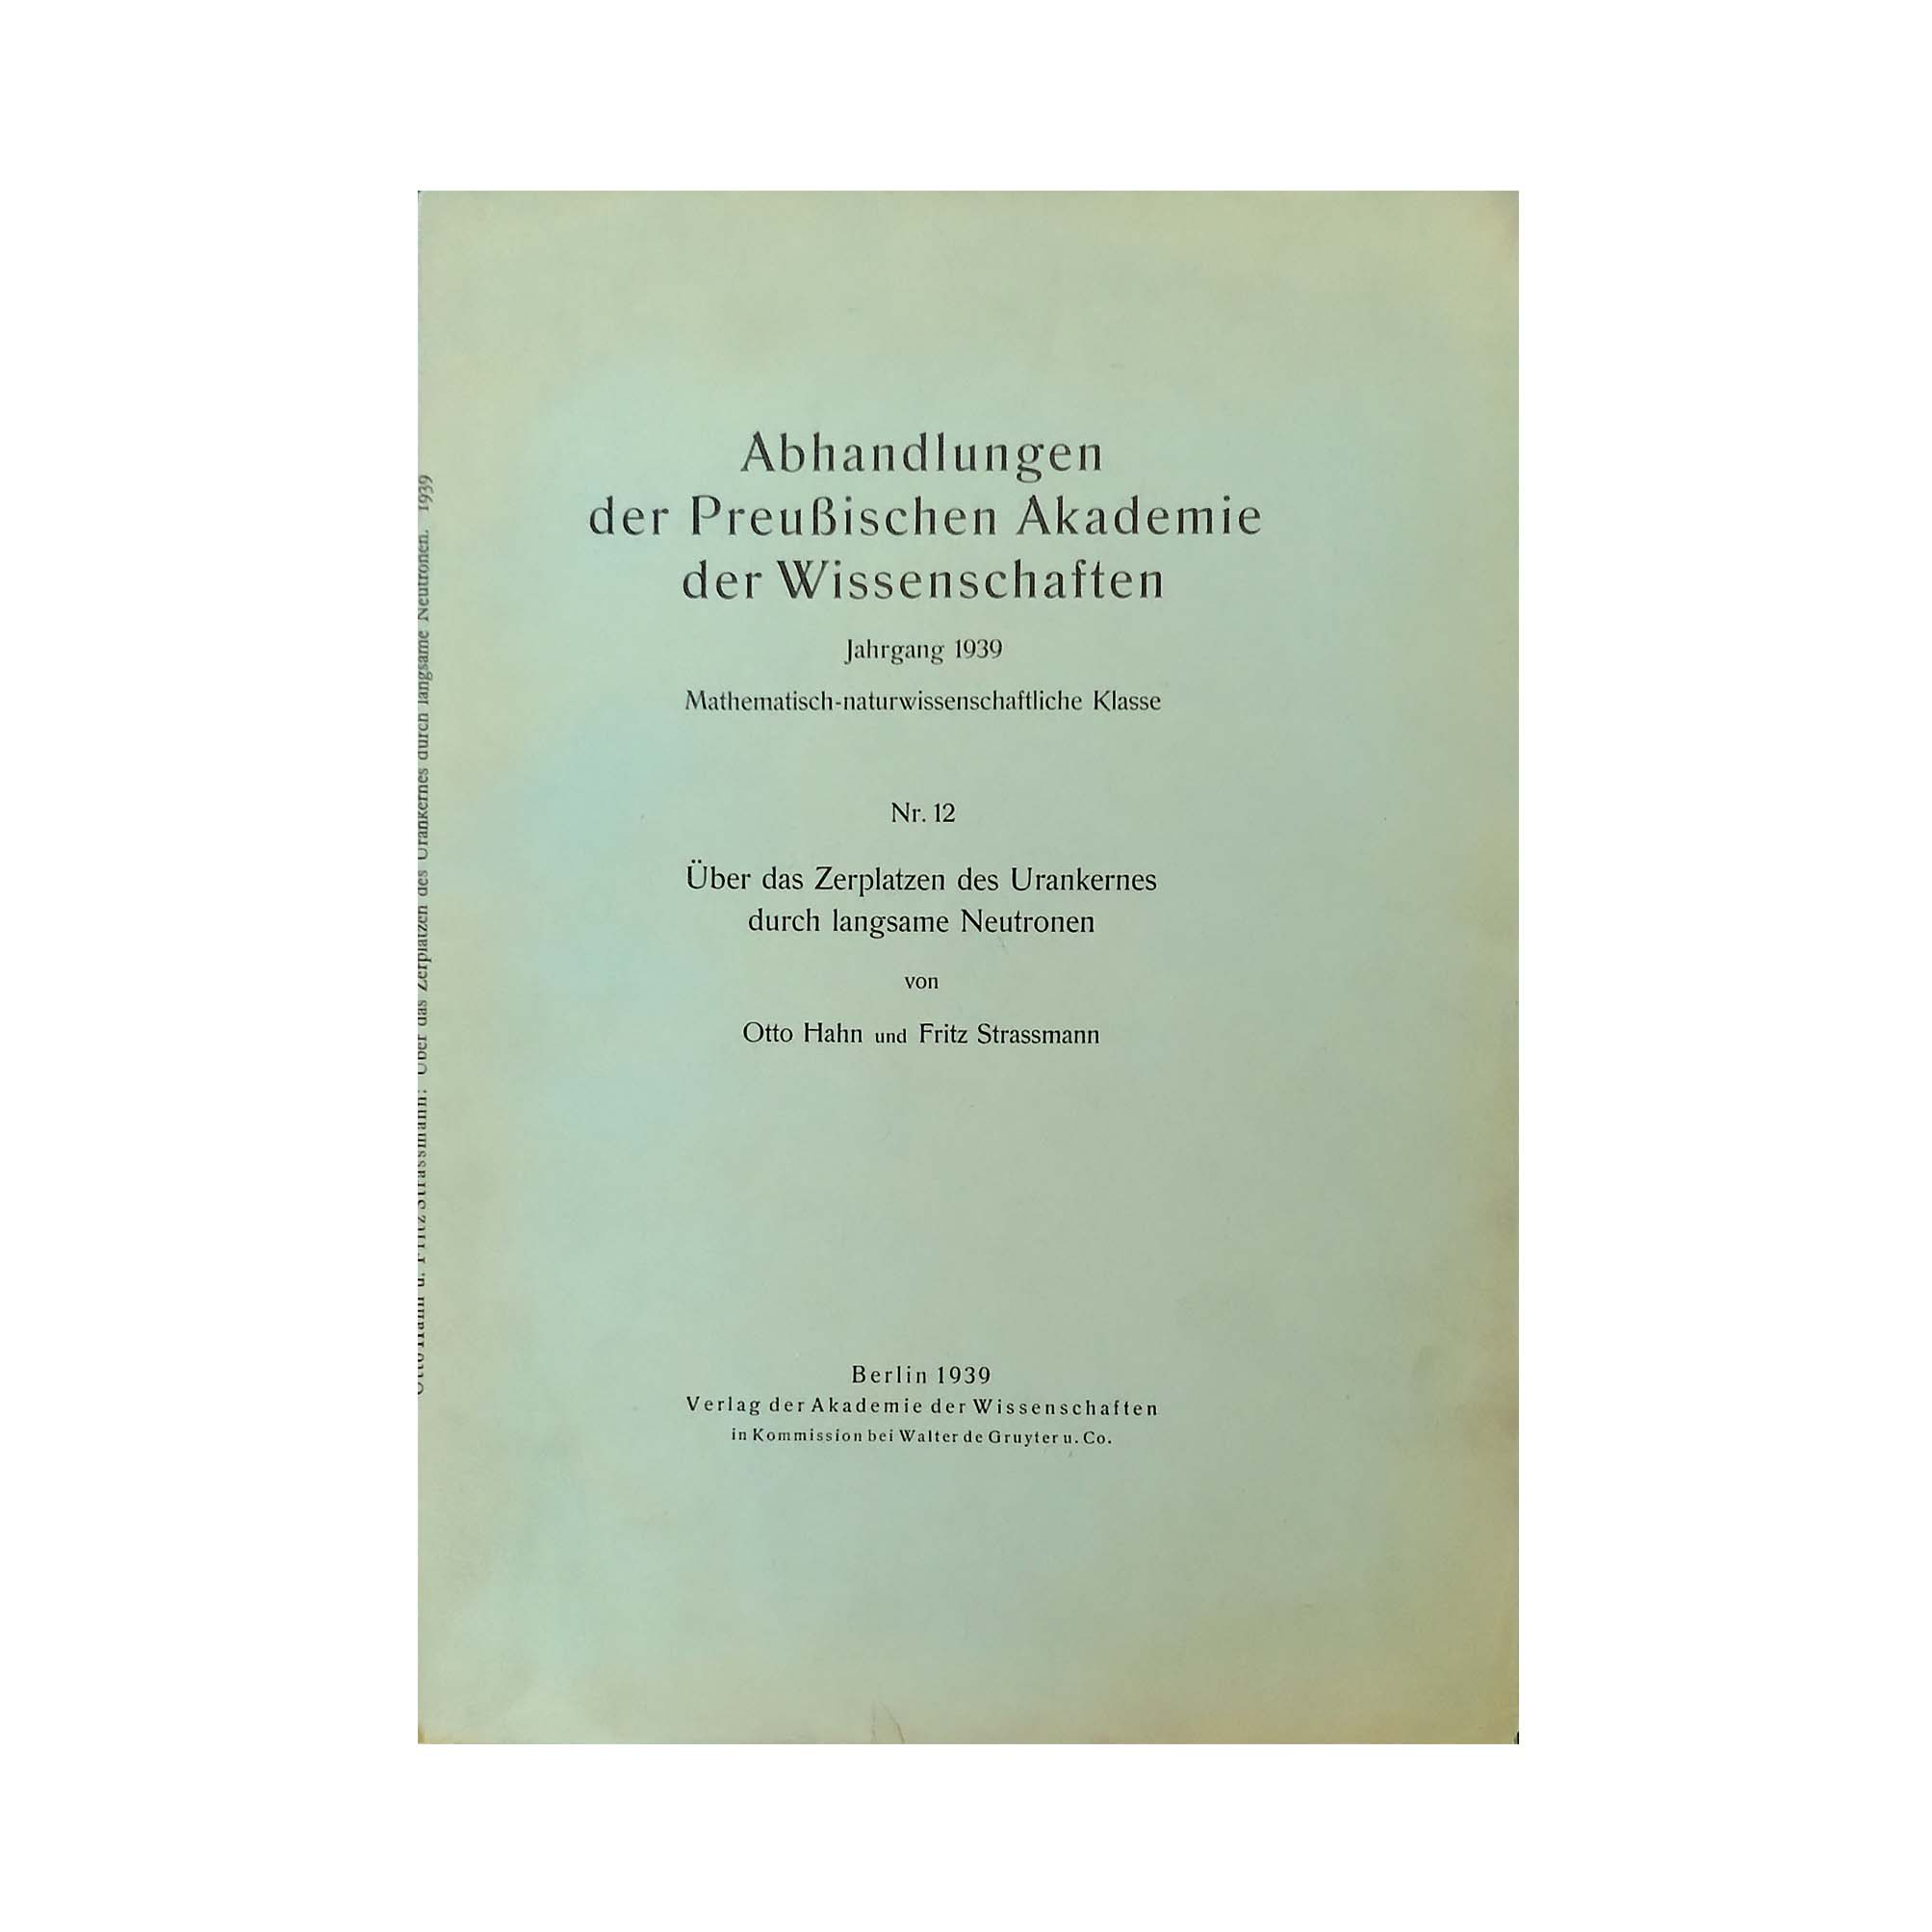 5841K-Hahn-Strassmann-Nucelar-Fission-1939-Offprint-Cover-recto-A-N.jpg